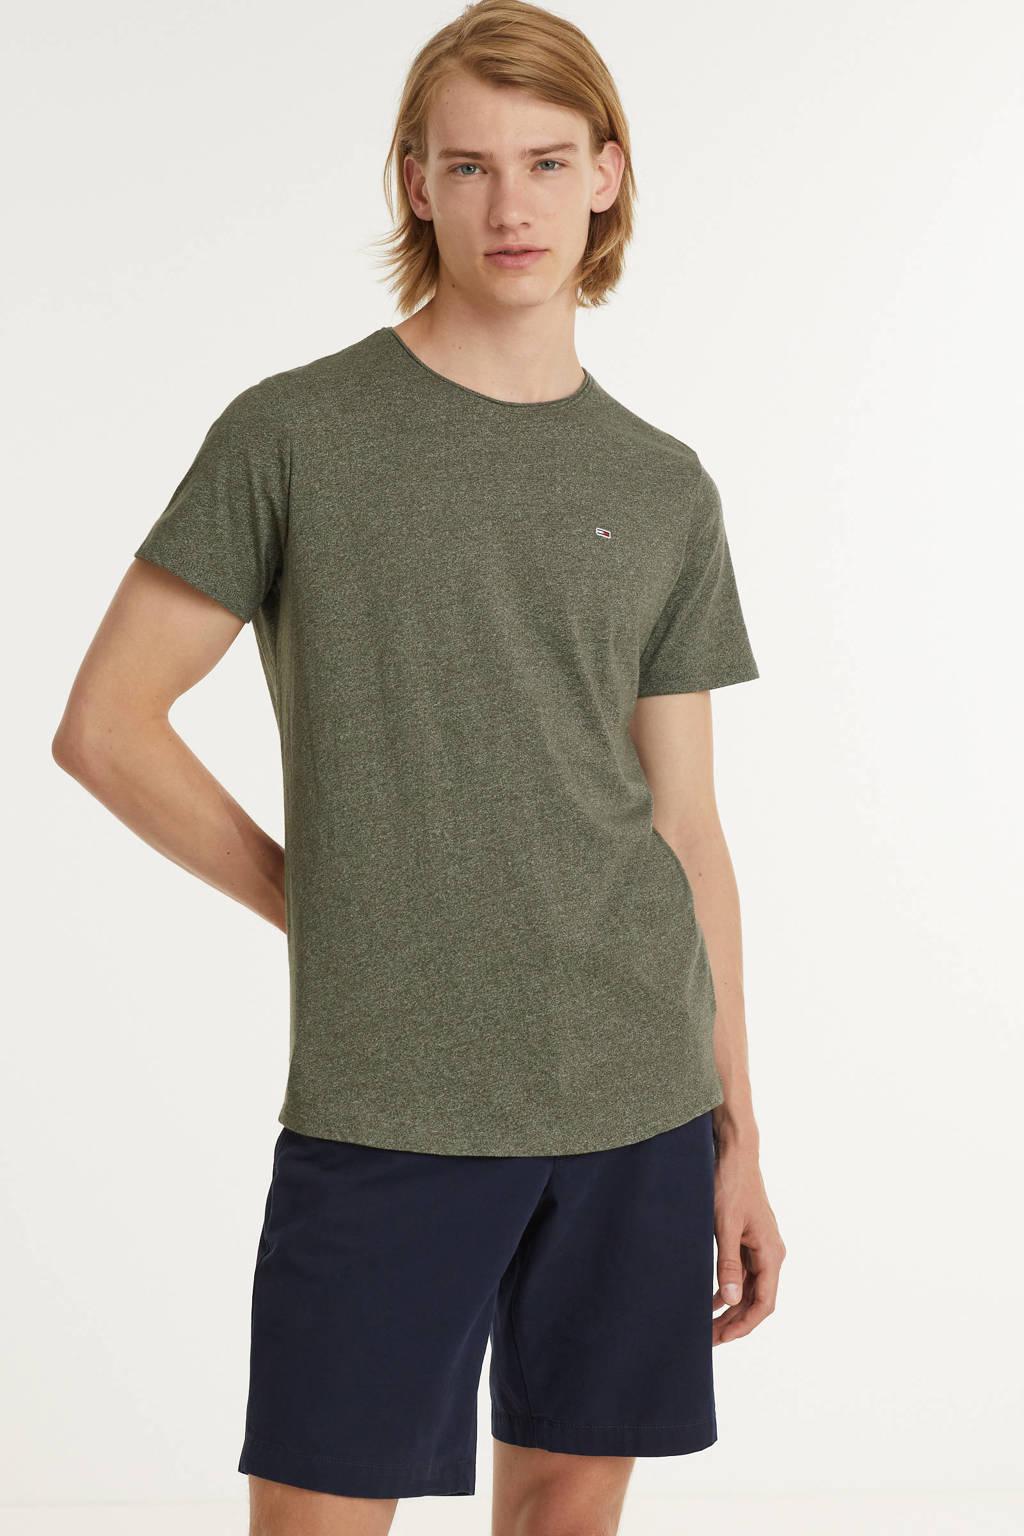 Tommy Jeans T-shirt Jaspe met biologisch katoen dark olive, Dark Olive